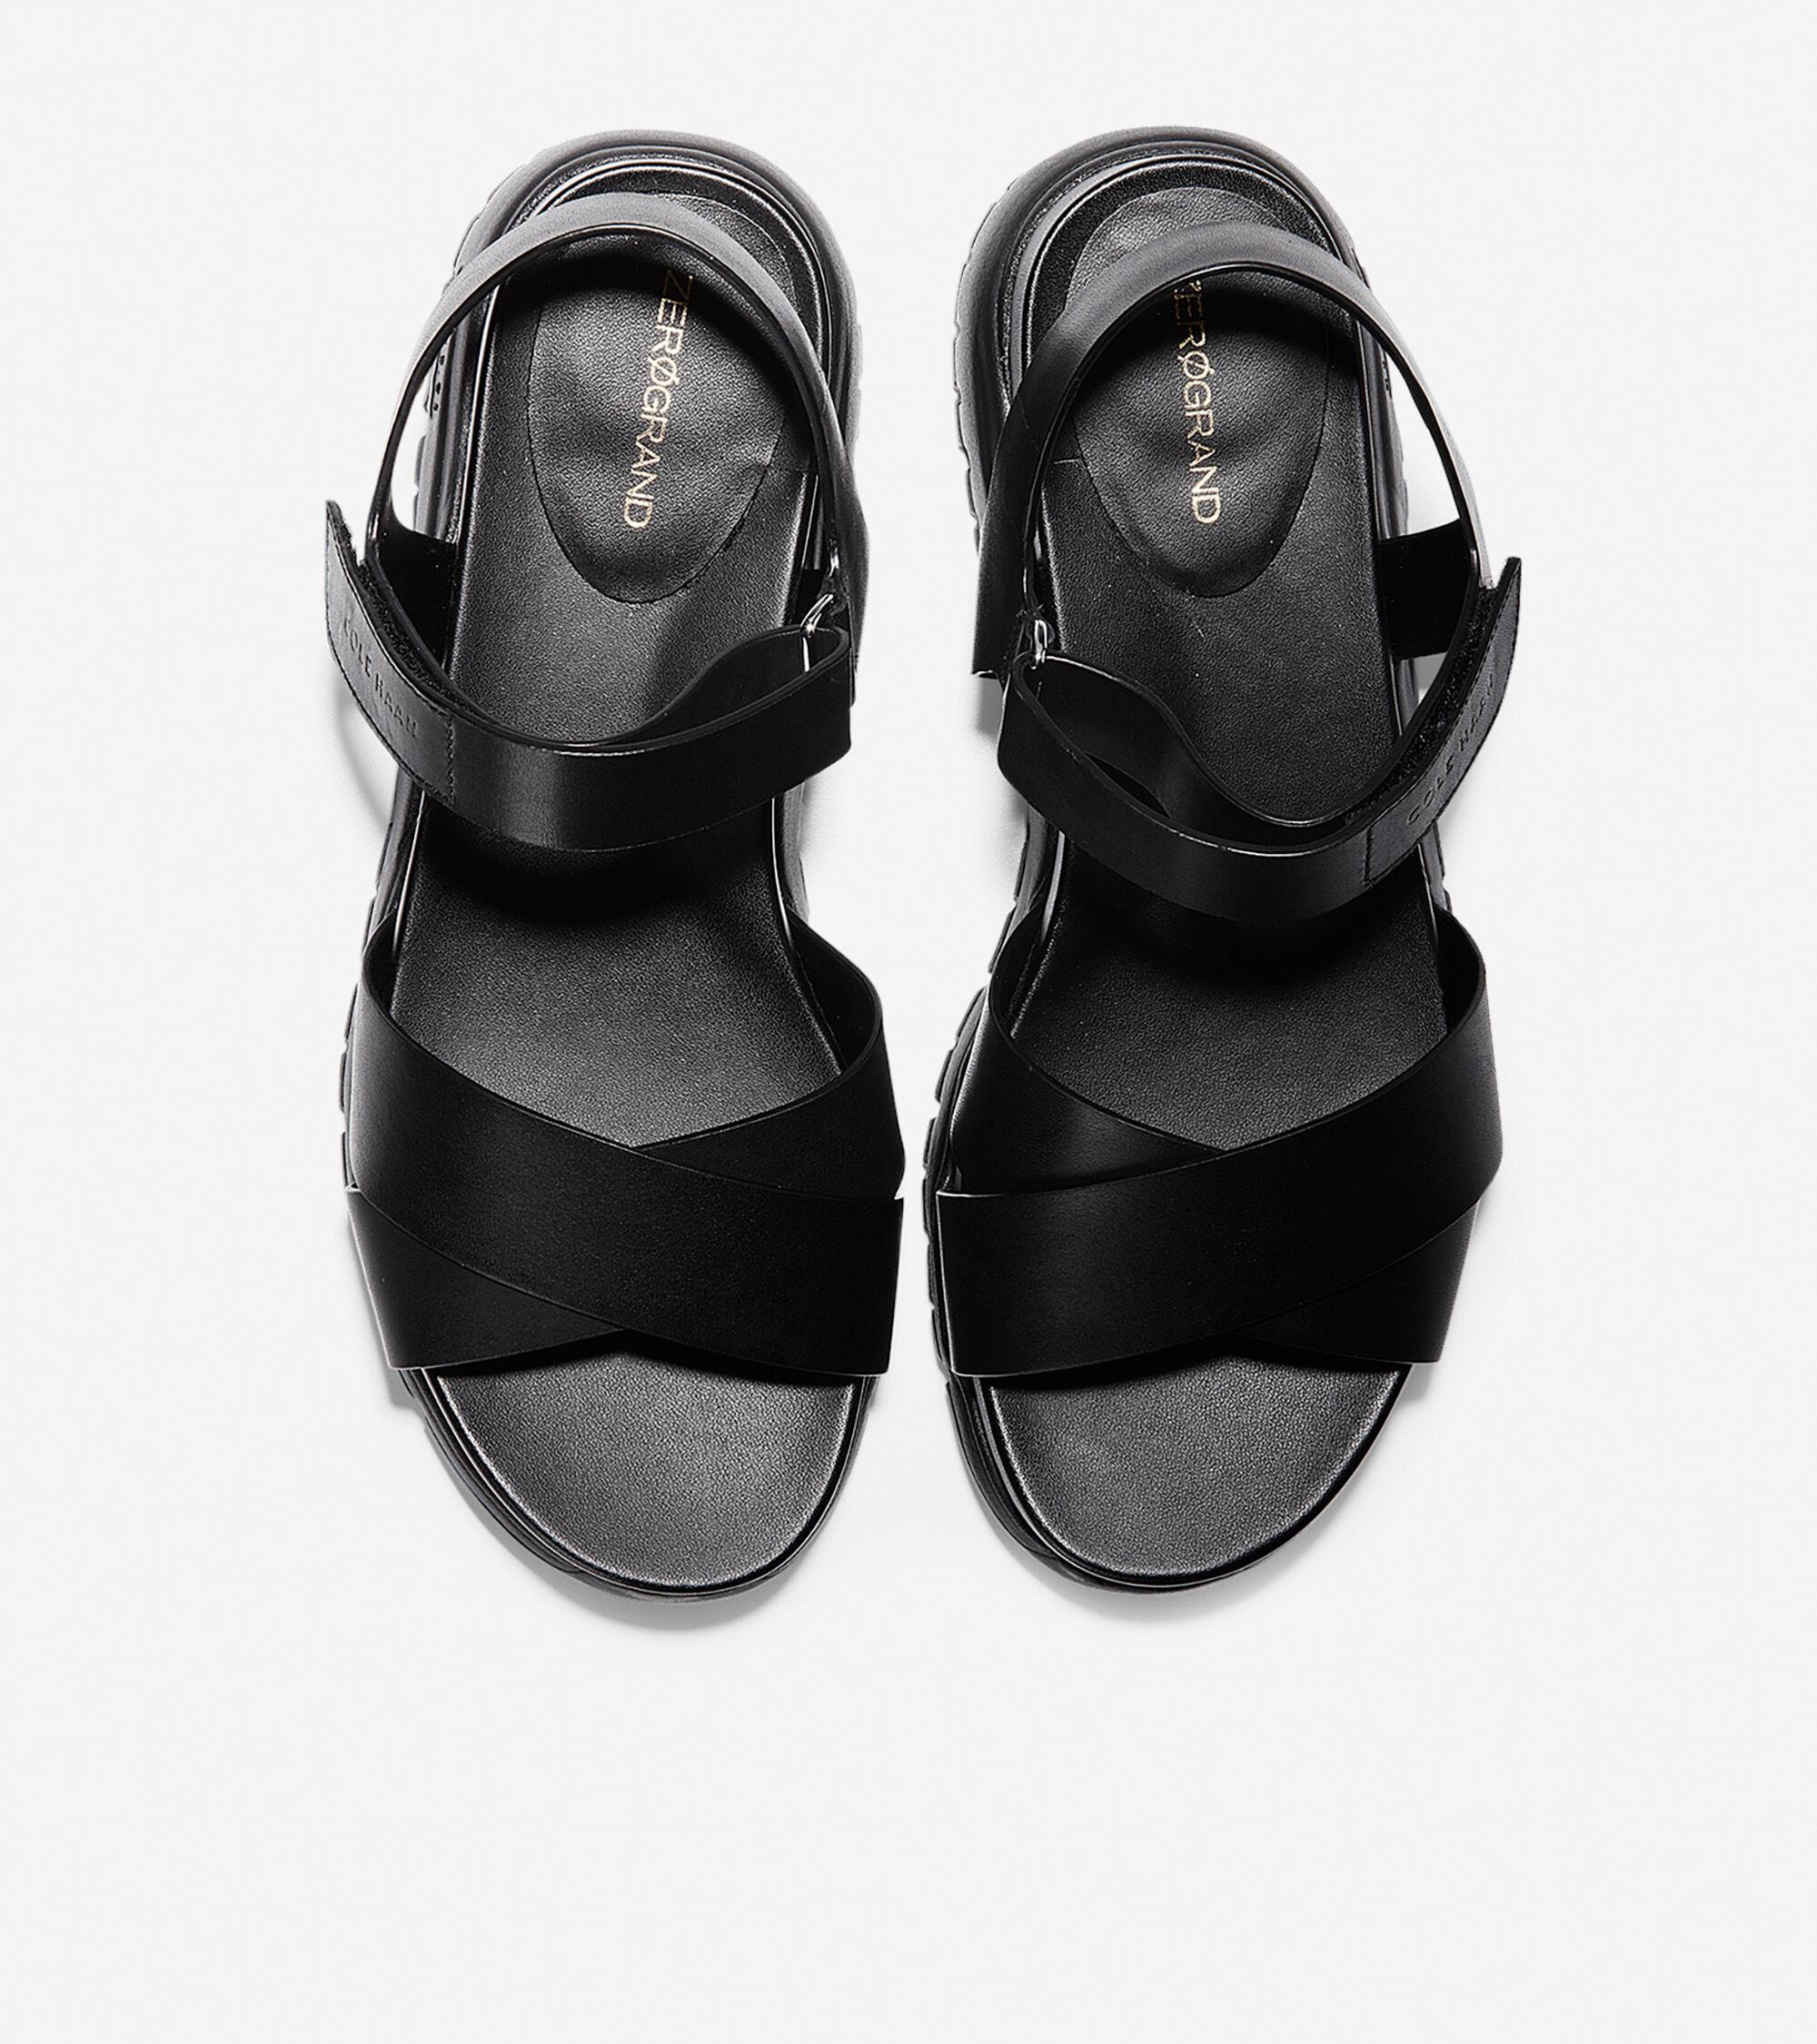 Criss Cross Sandal in Black Leather